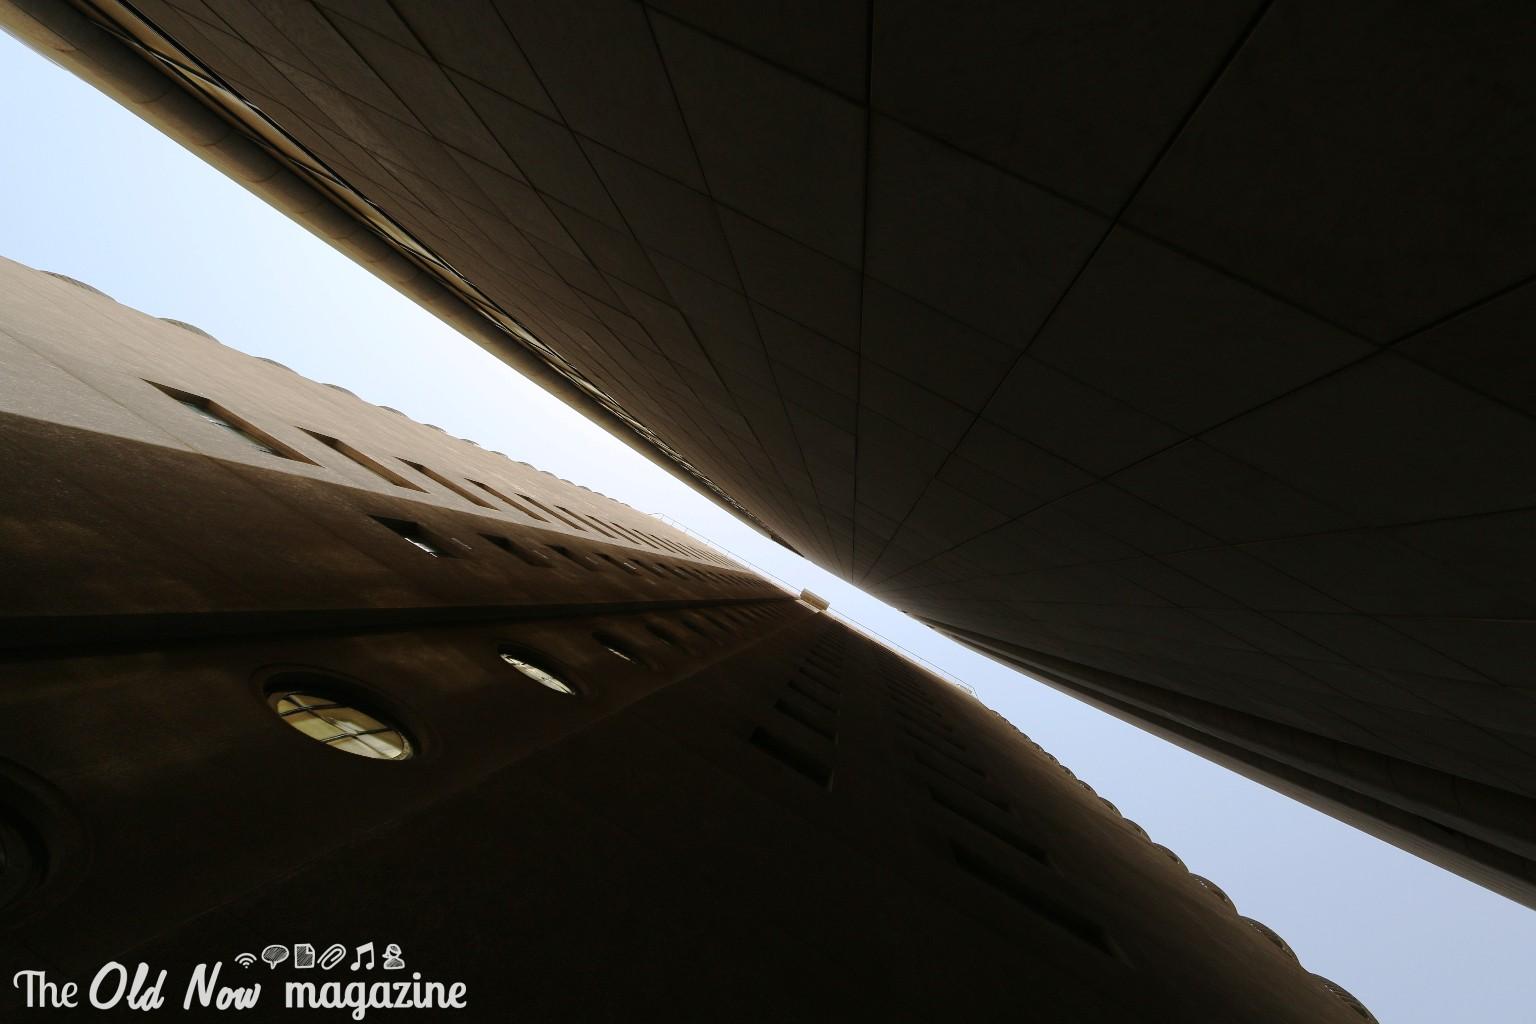 Abu Dhabi THEOLDNOW DAY 1 (17)